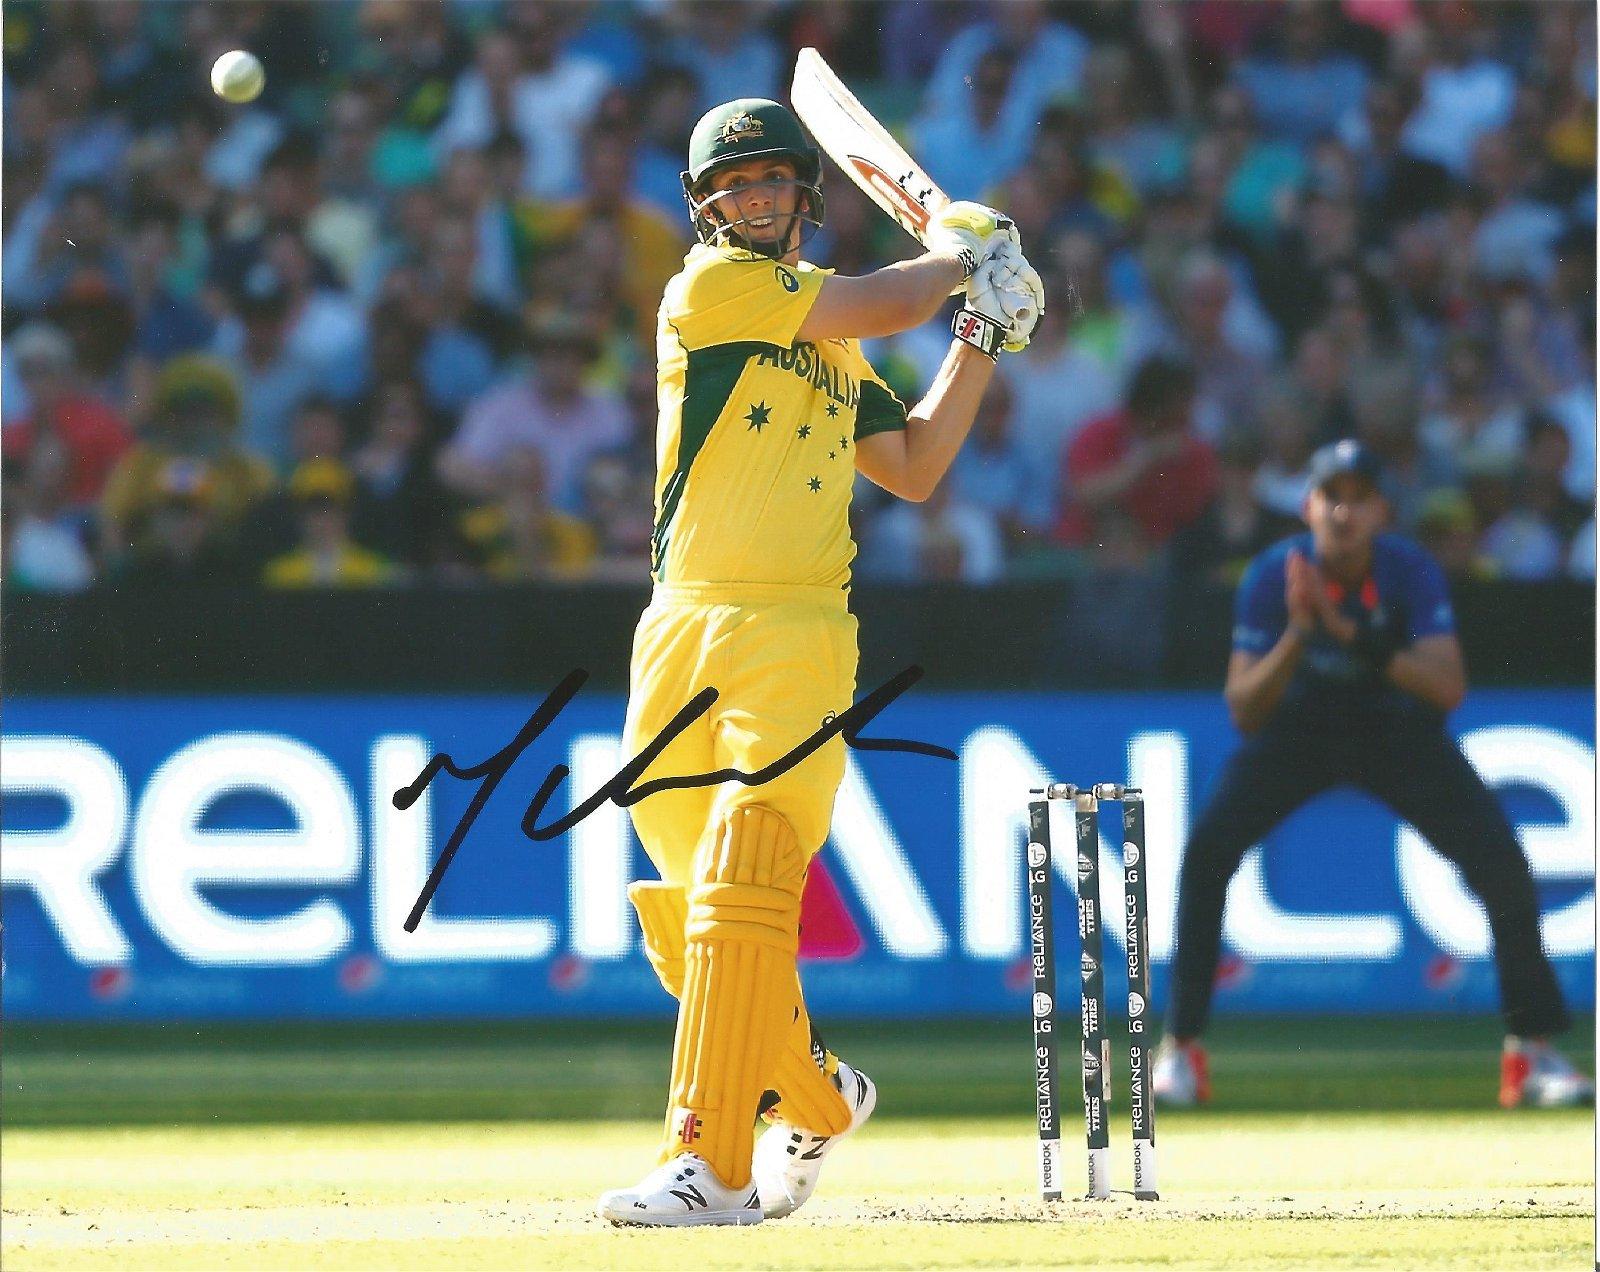 Mitchell Marsh Signed Australia Cricket 8x10 Photo .